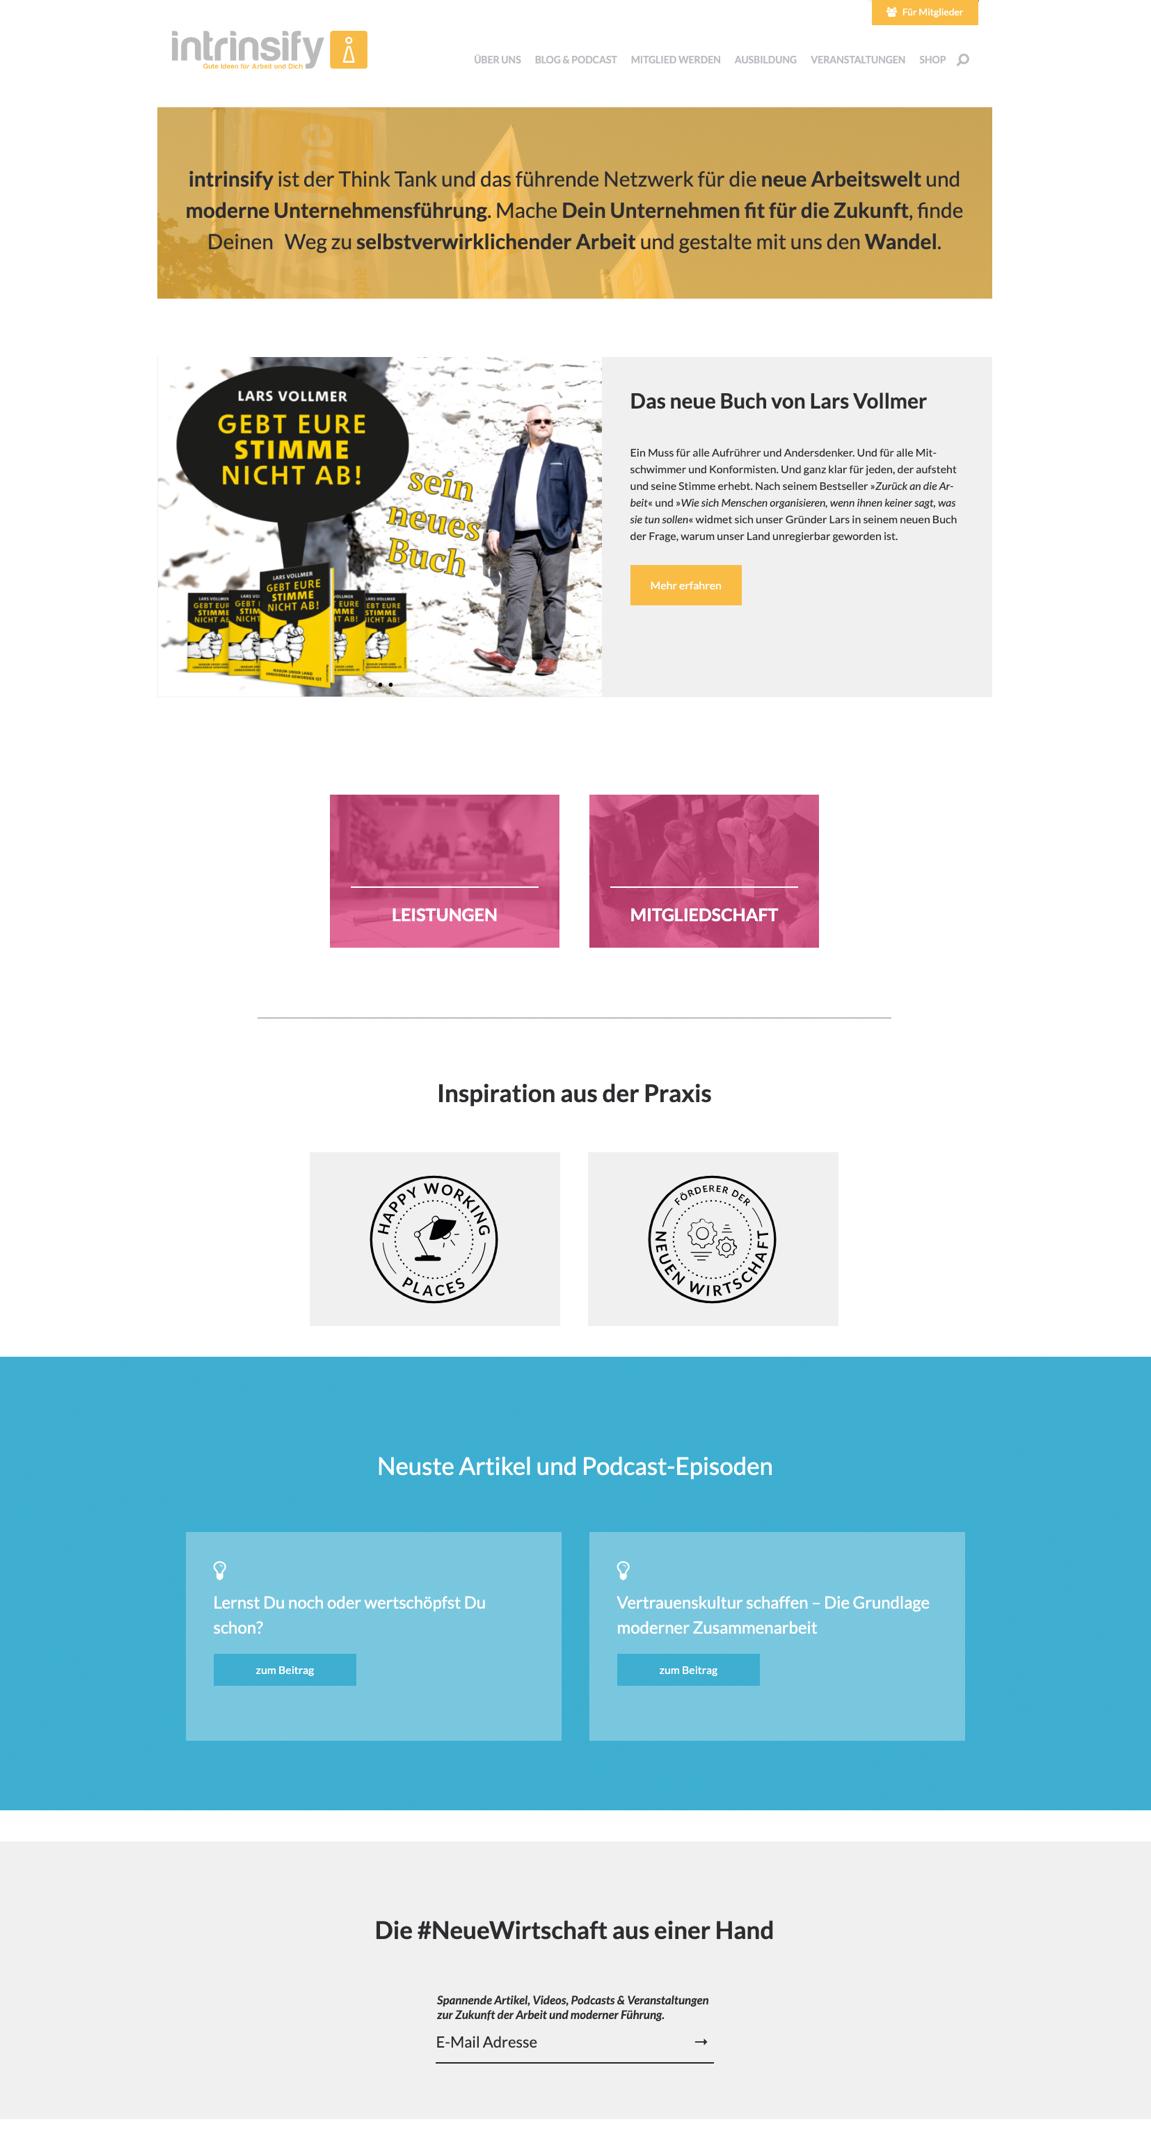 Website - intrinsify